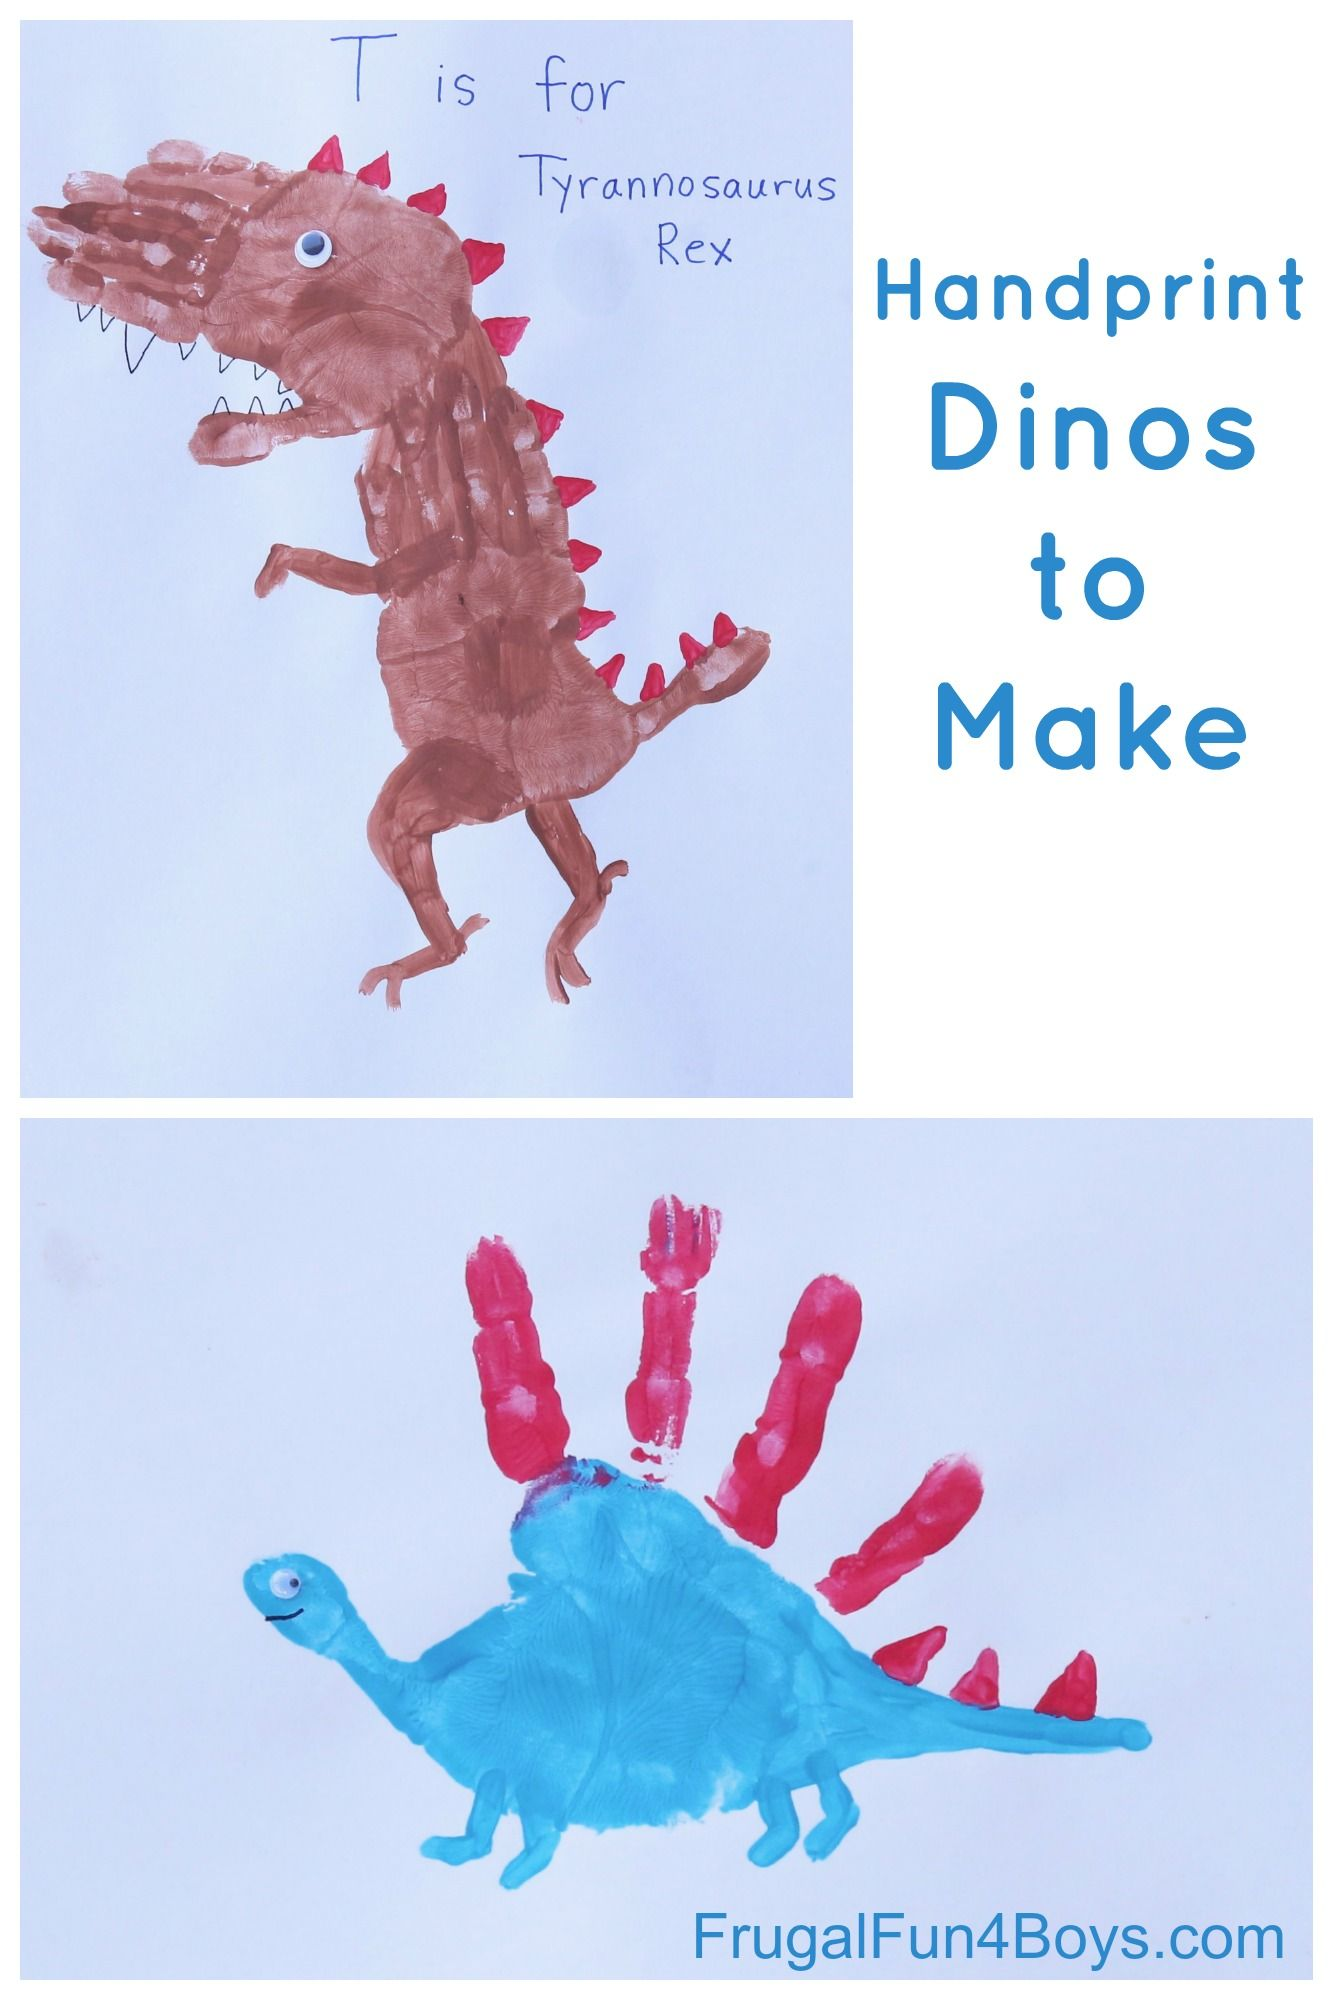 craft for kids handprint dinosaurs dinosaur crafts craft and